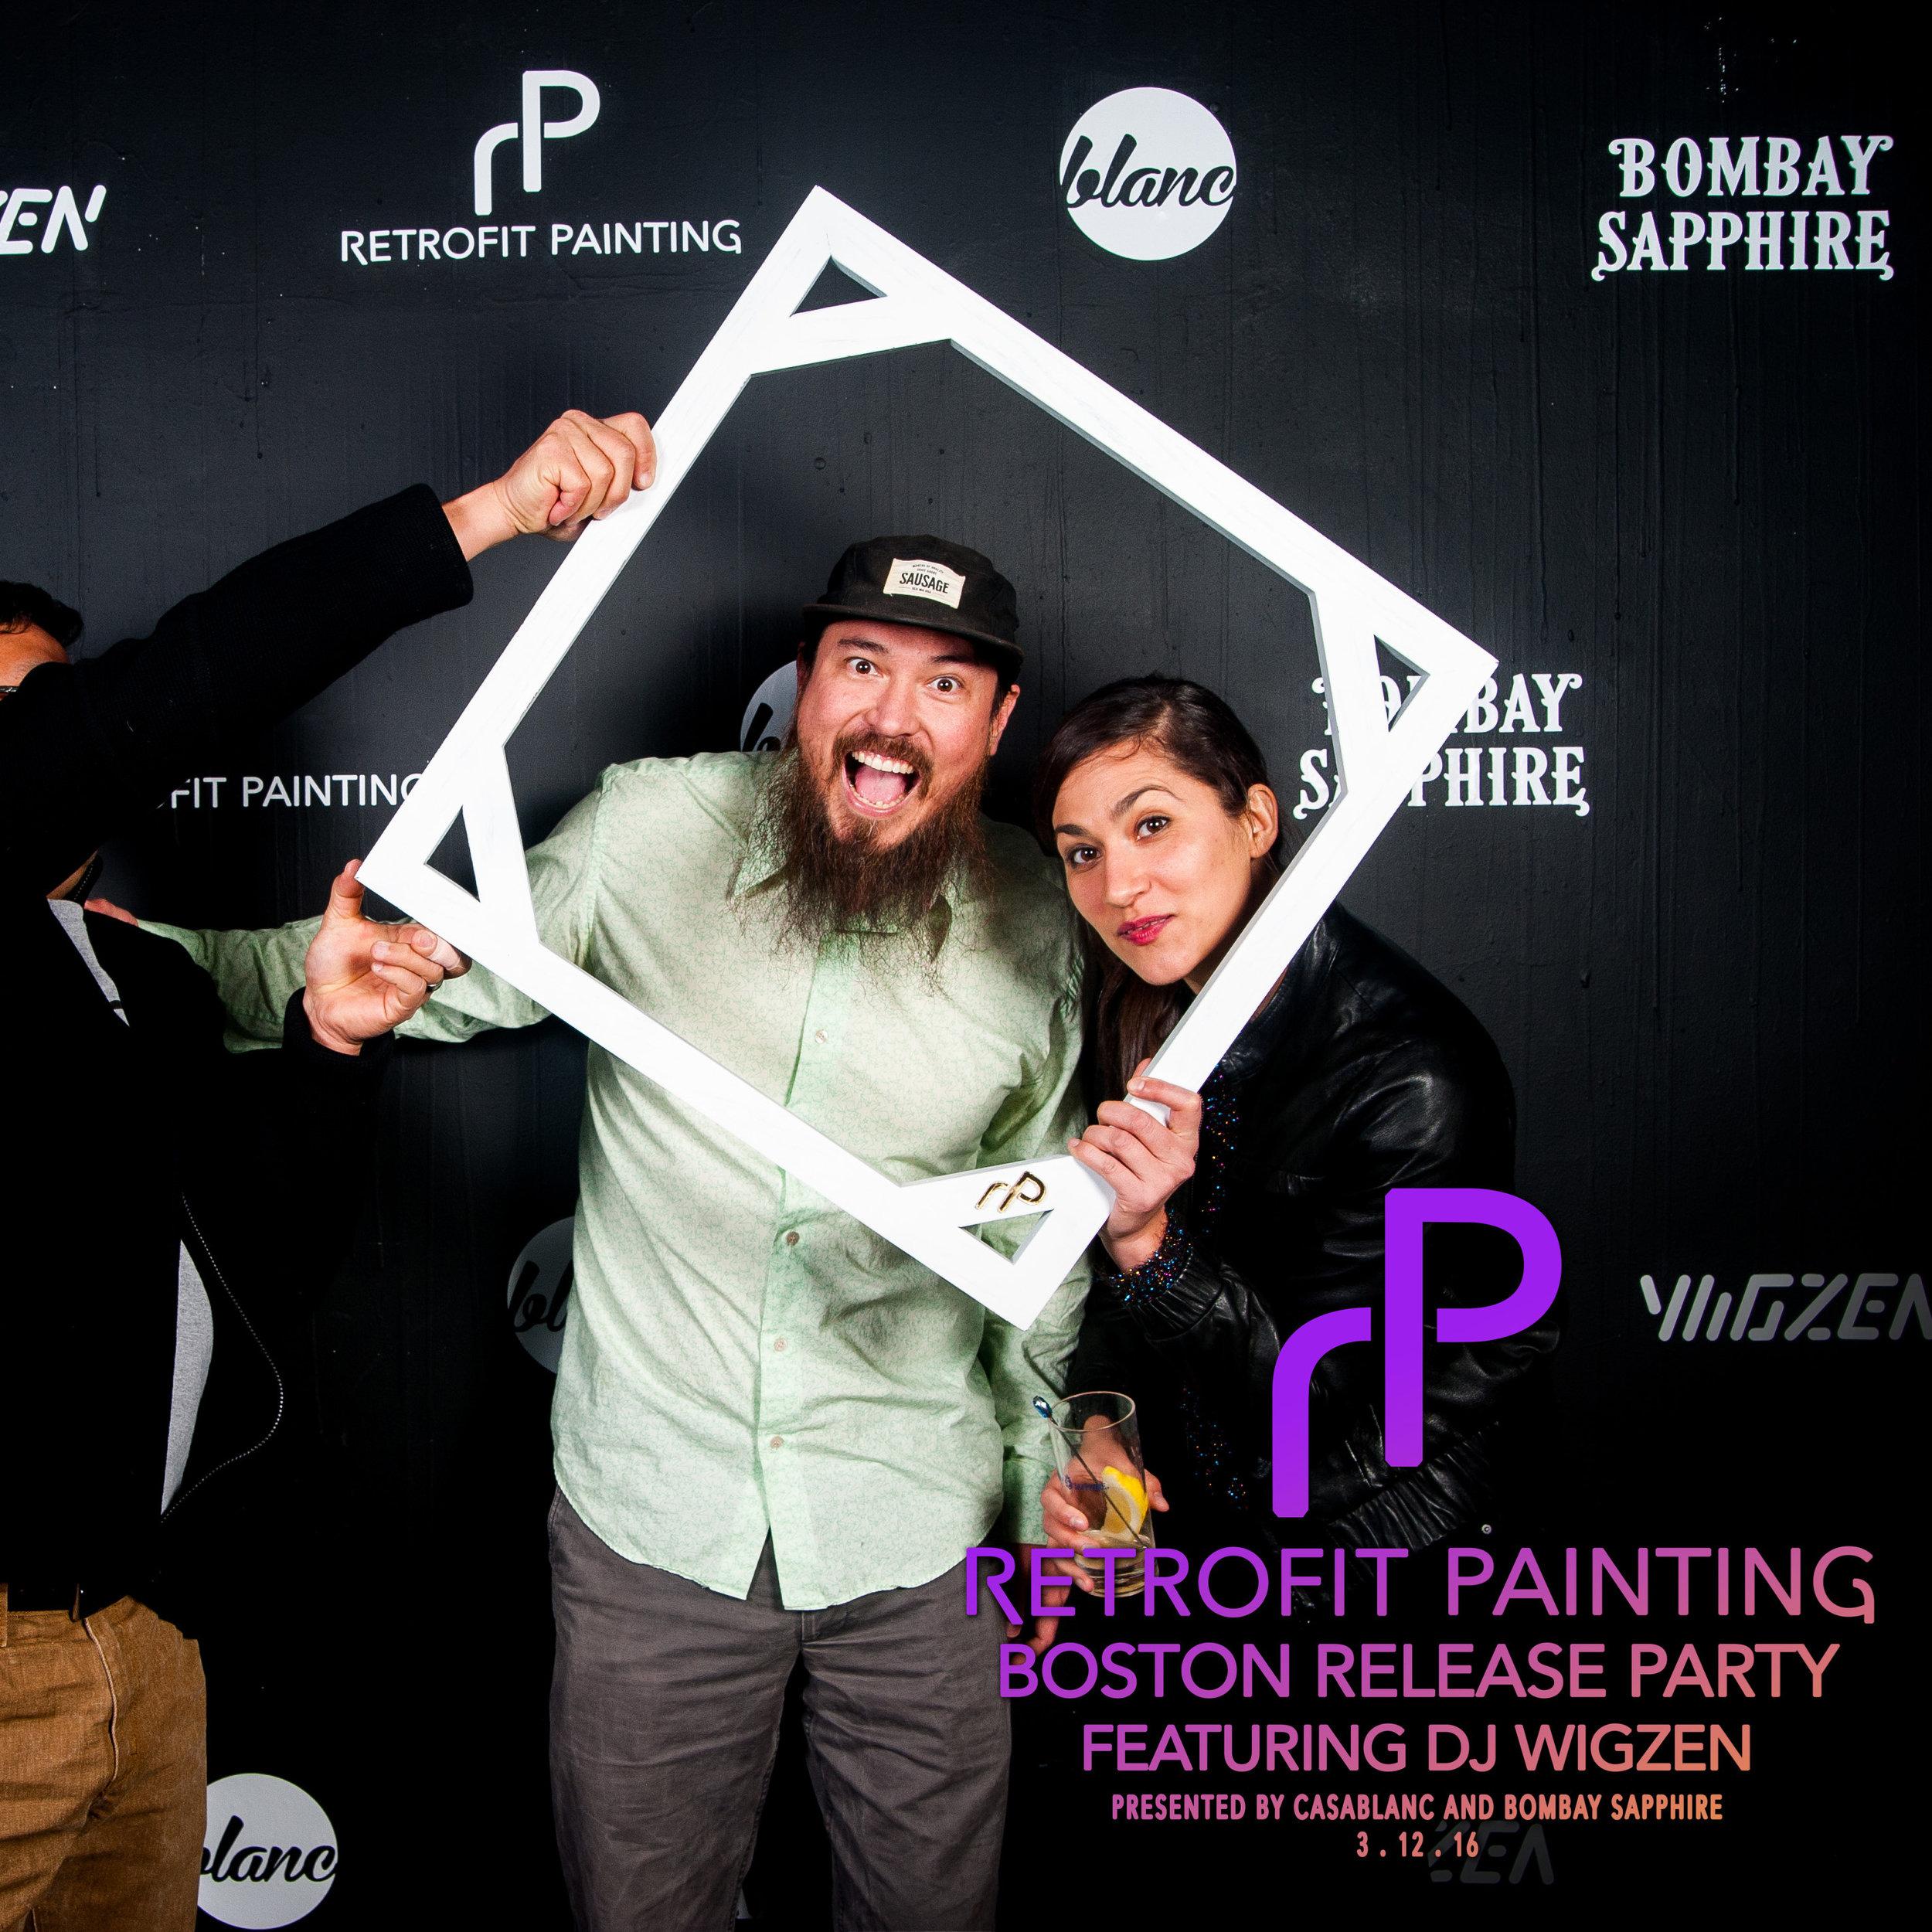 Retrofit Painting Boston Release Party 062(2).jpg